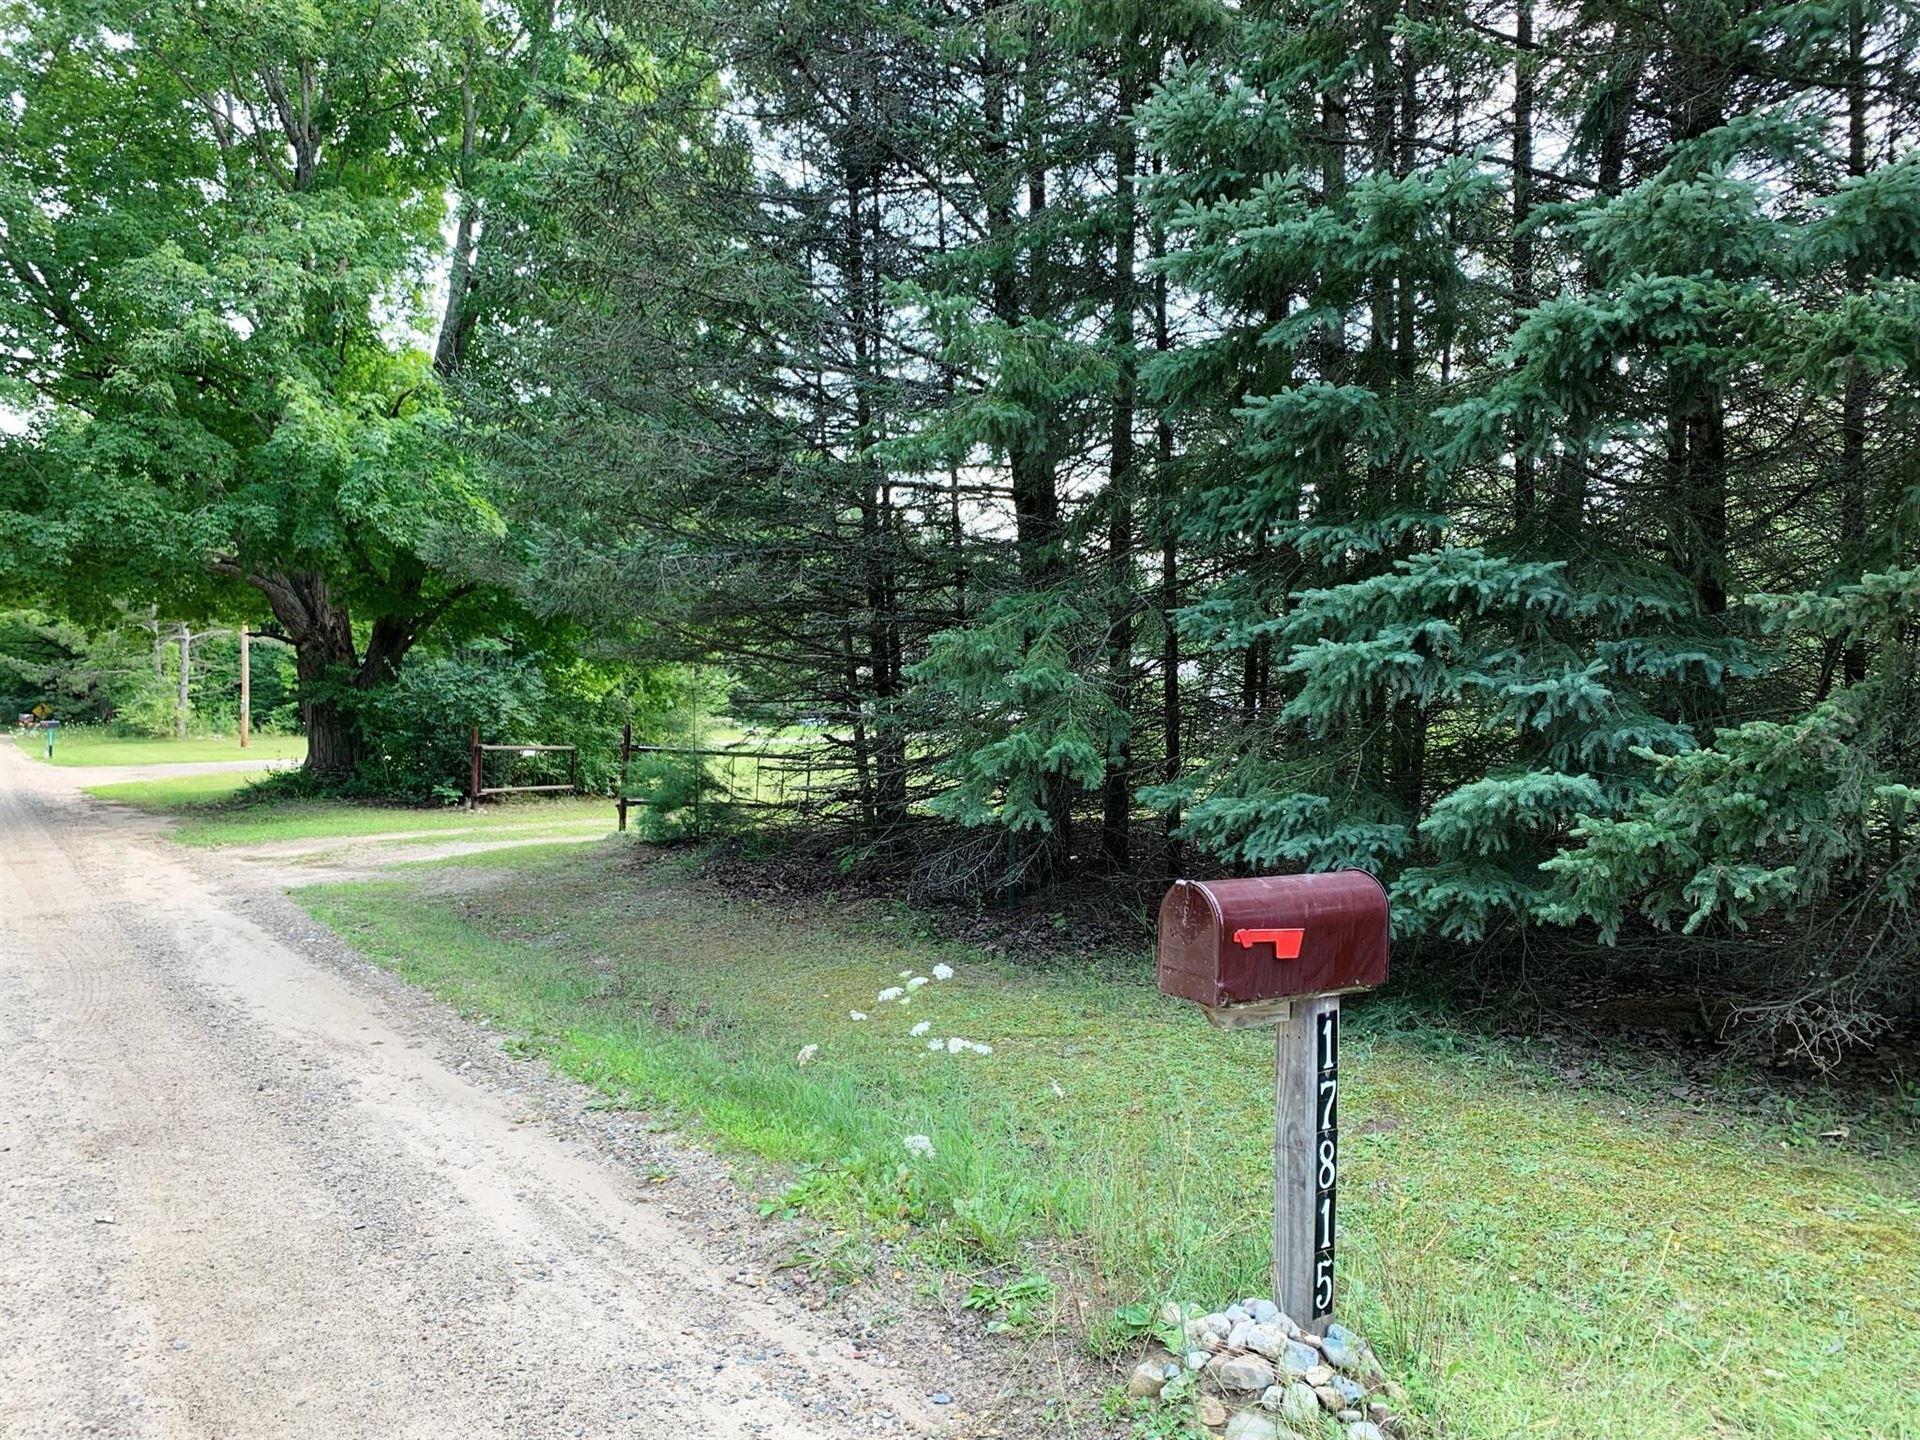 17815 Old Logging Road, Hersey, MI 49639 - MLS#: 21111504